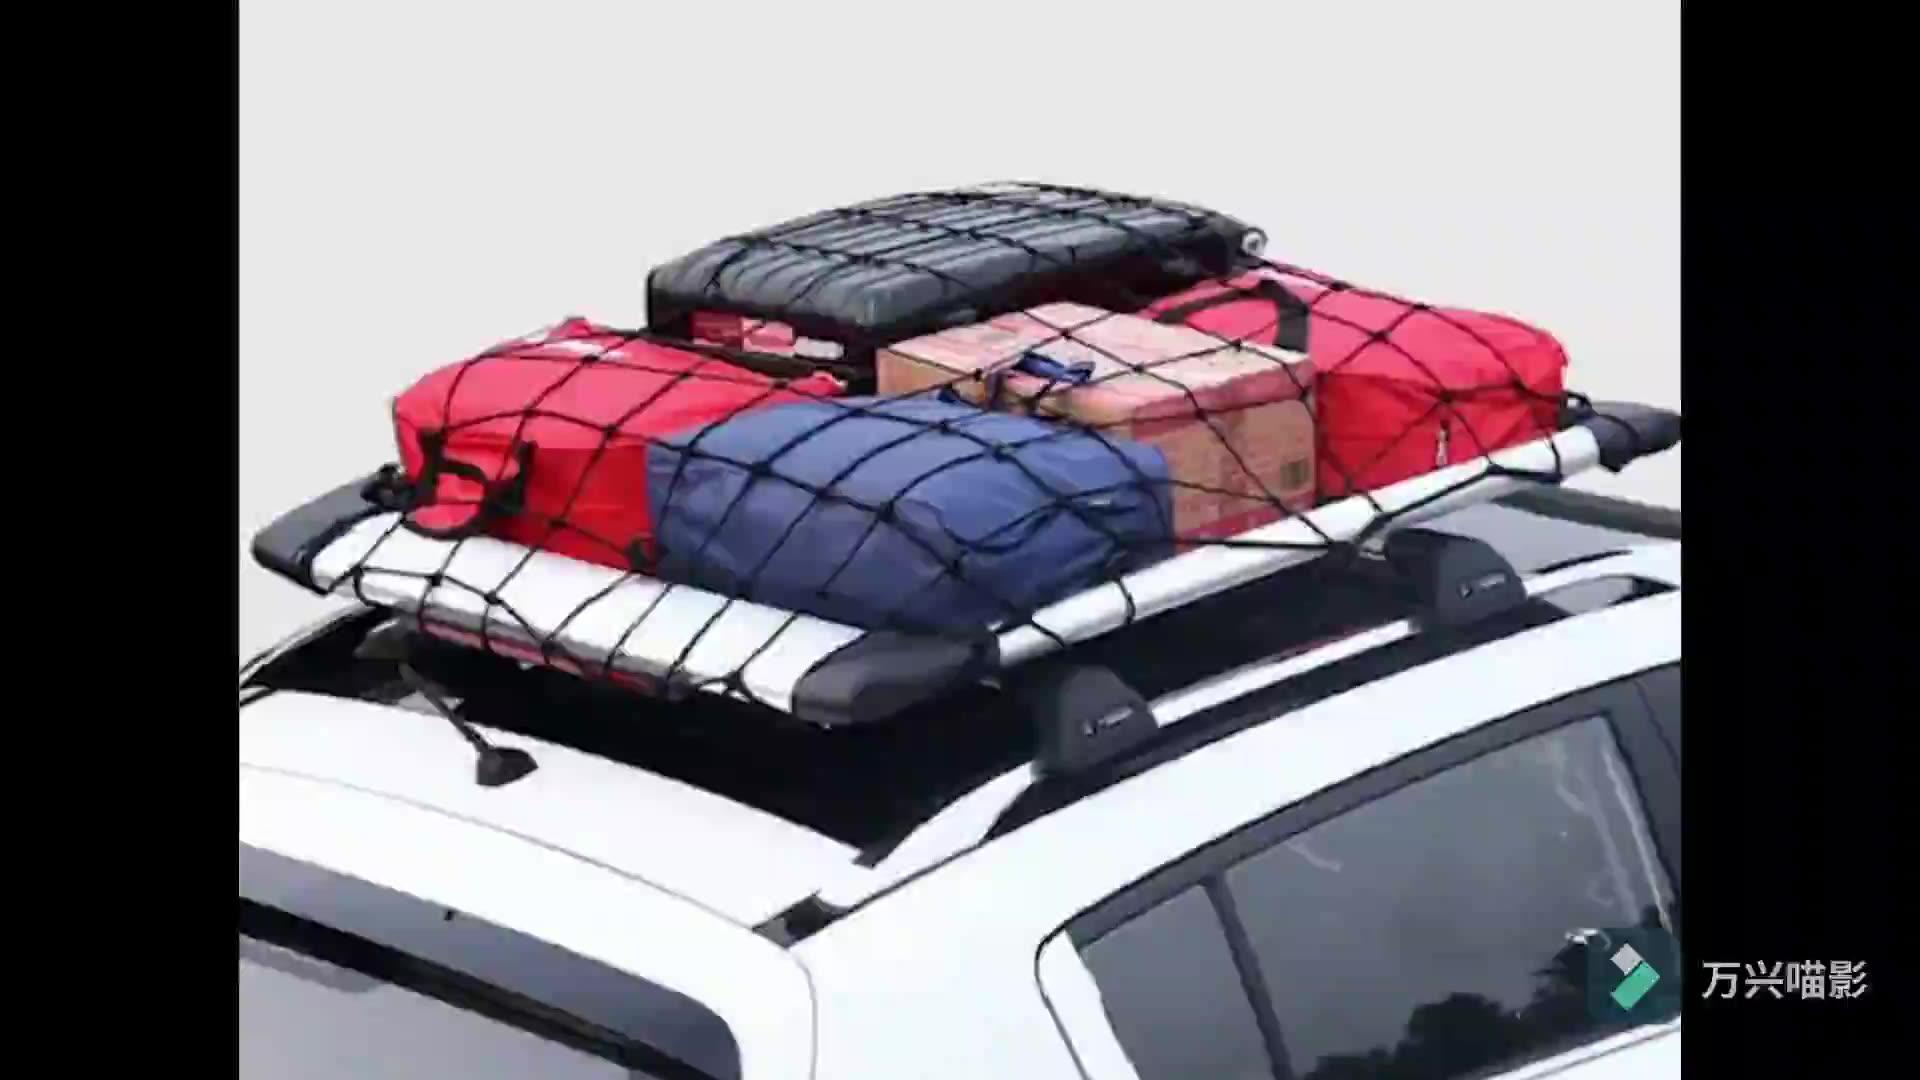 Universal 4x4 aluminium Fracht Korb Auto Dach Gepäckträger für Toyota Hilux 4runner Fj150 Patrol Ford ranger Jimny Pickup